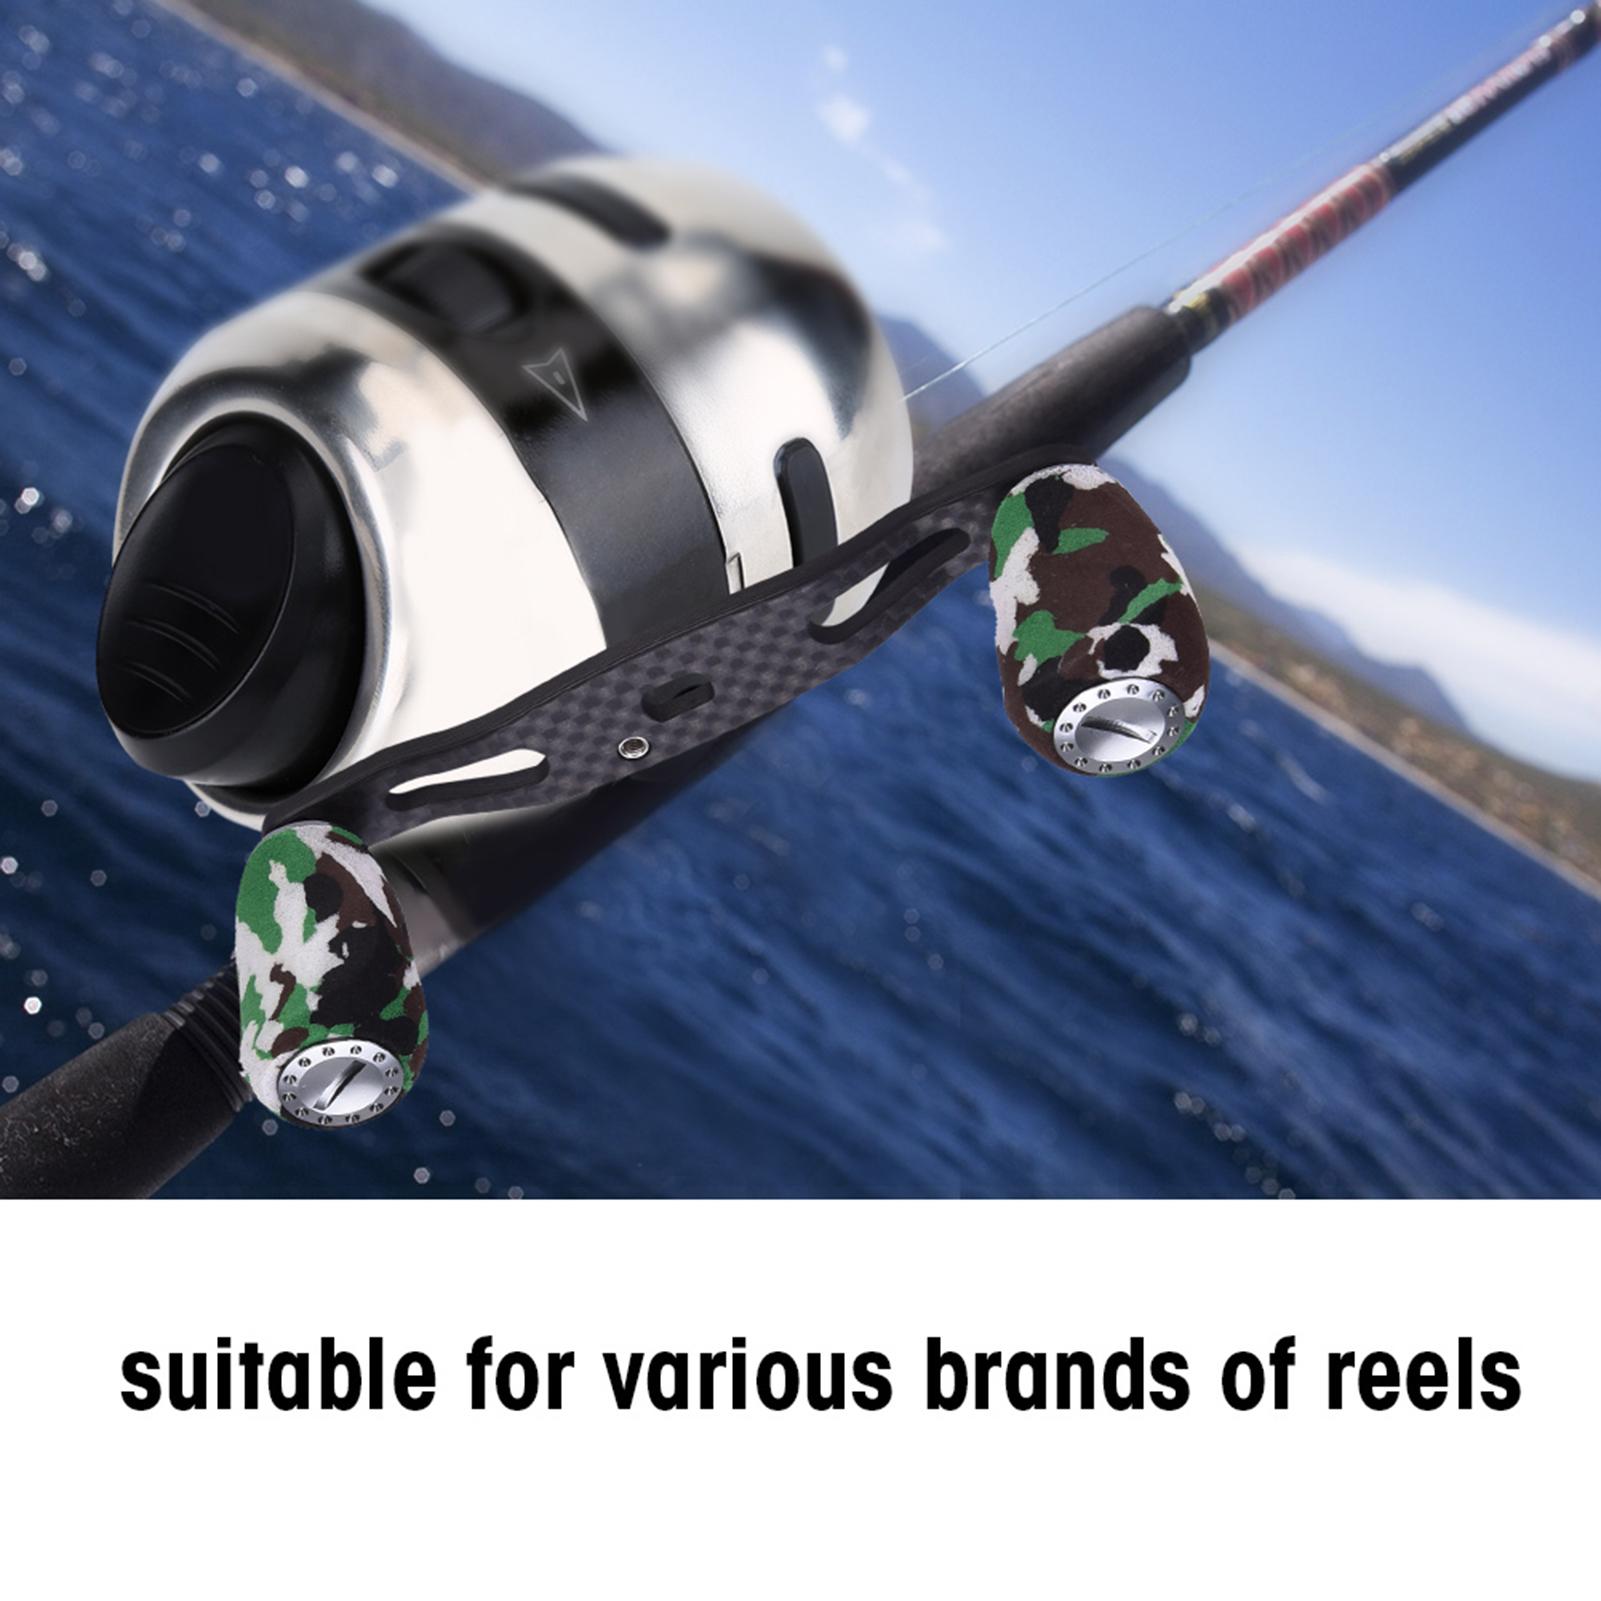 Portable-Carbon-Fiber-Fishing-Reel-Handle-Knob-For-Baitcasting-Fishing-Reel-LJ thumbnail 15